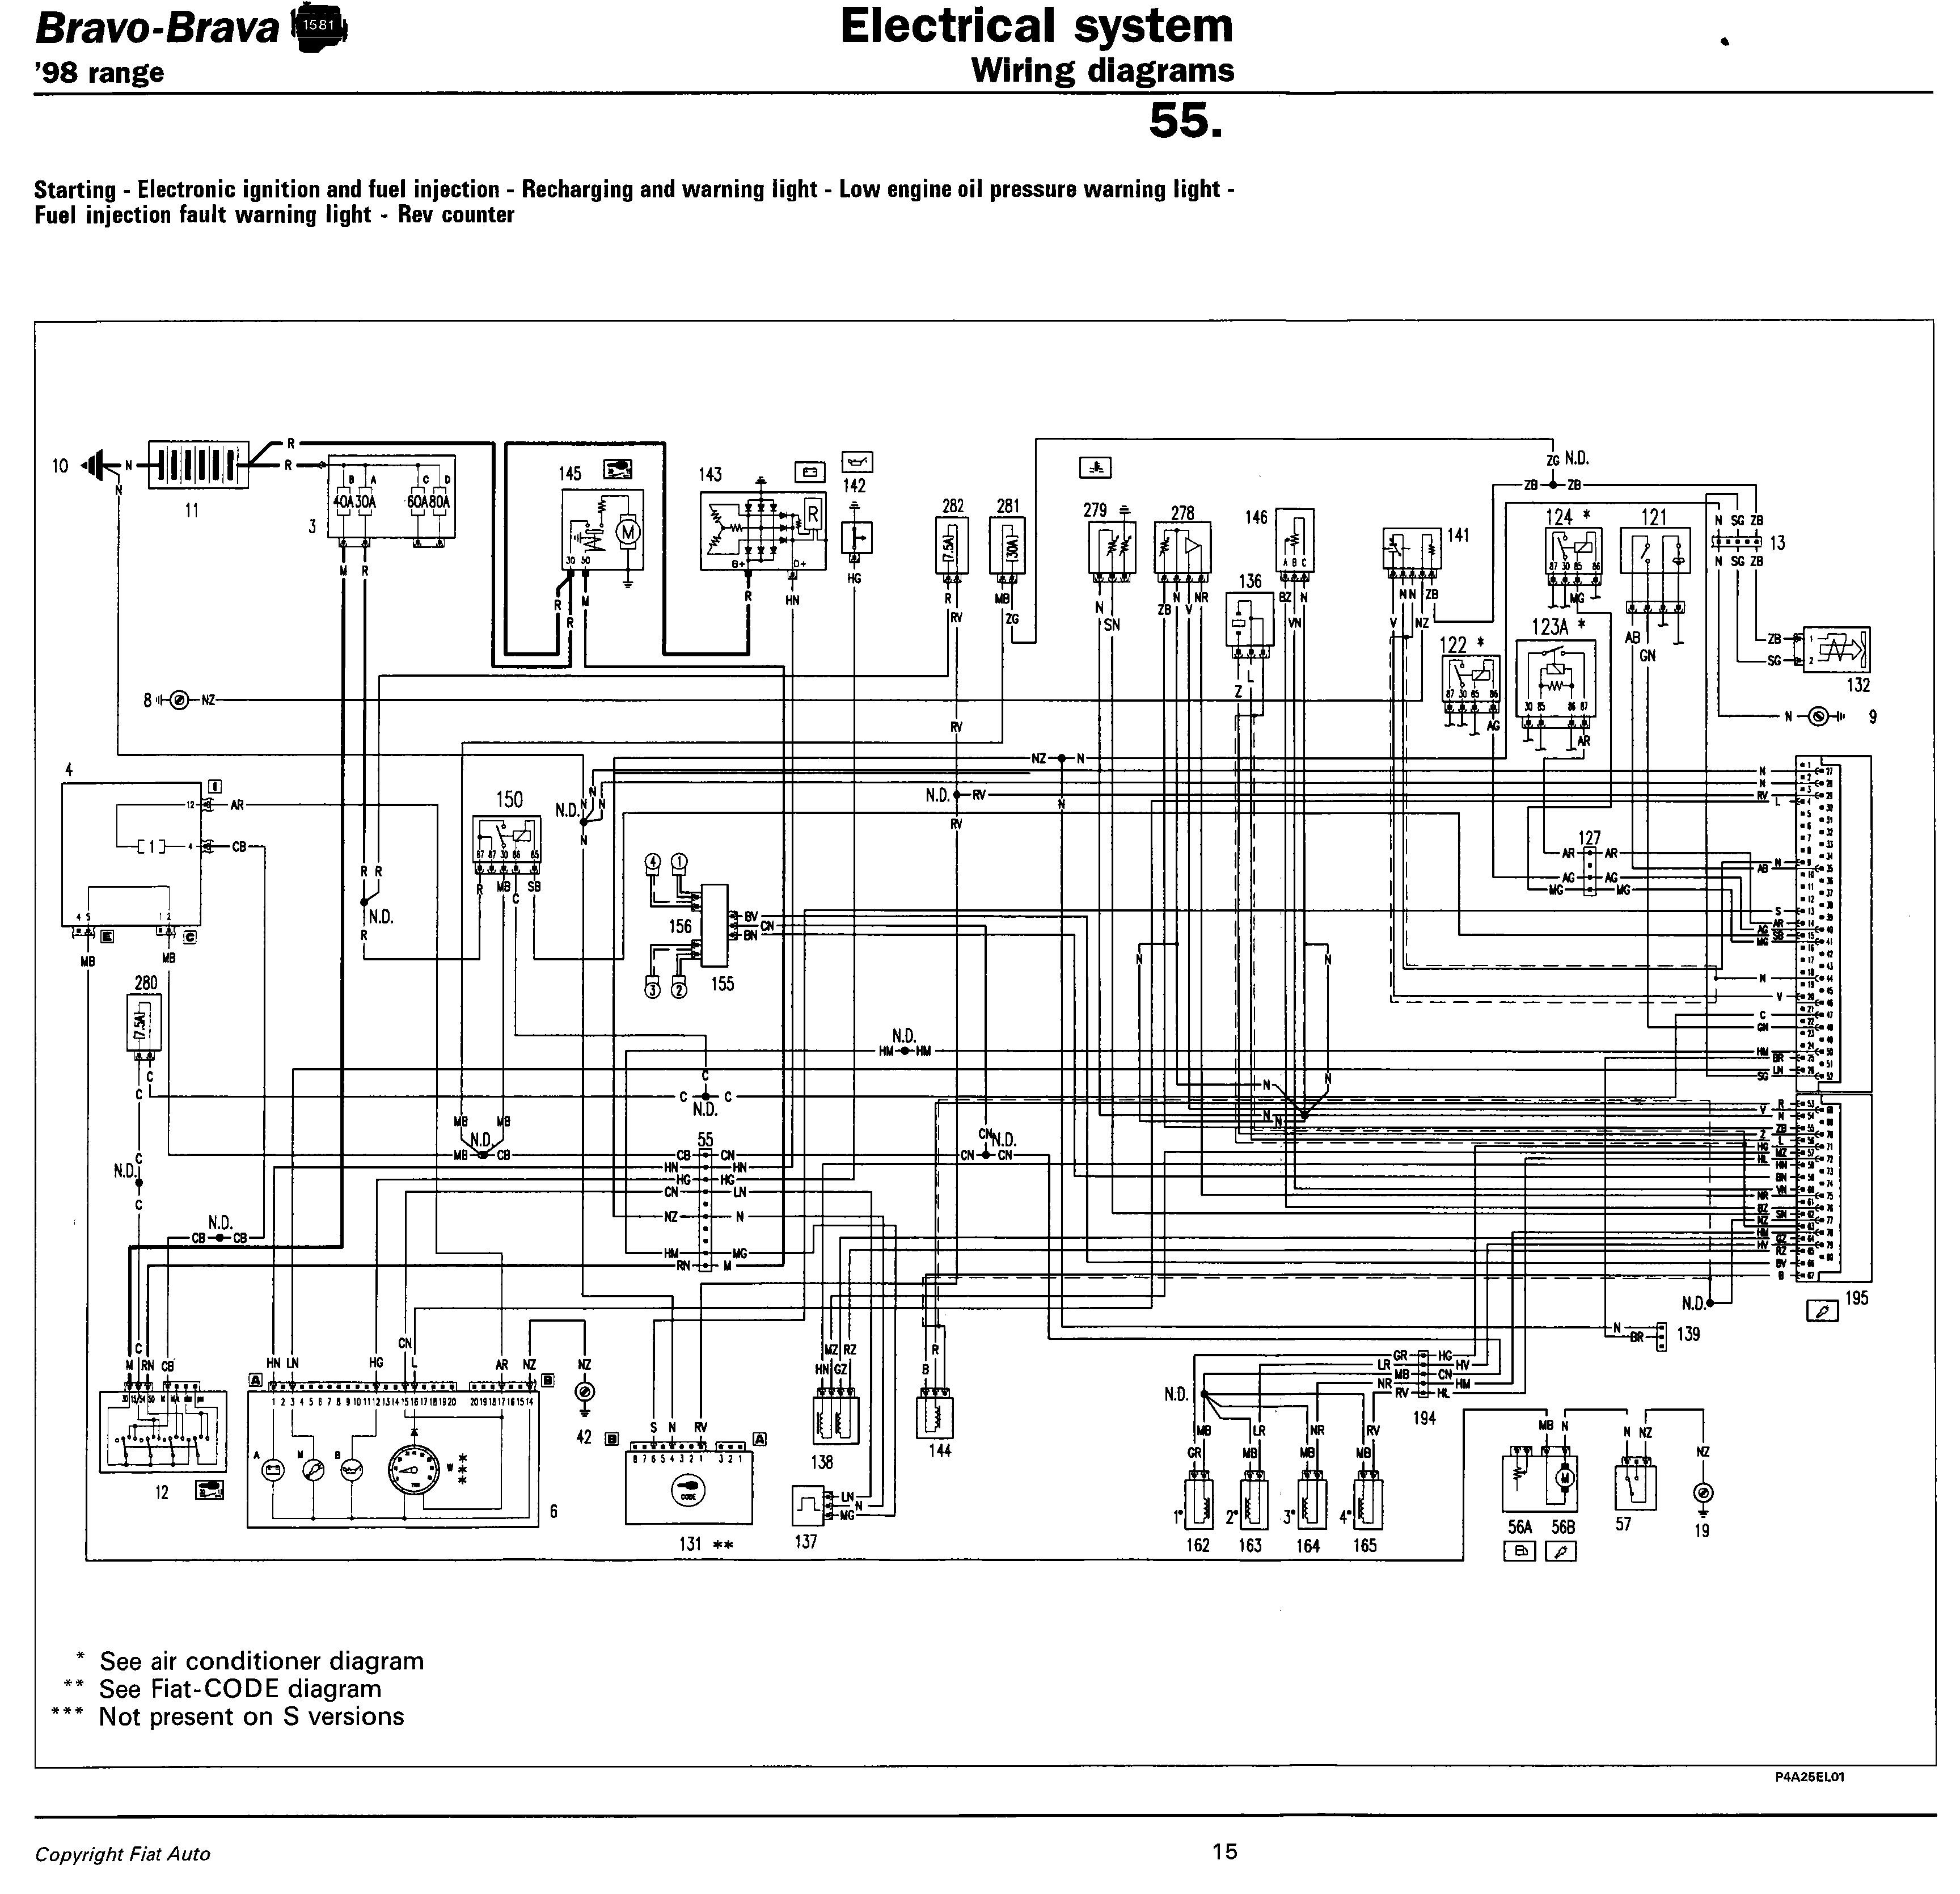 2012 fiat 500 engine diagram bz 4113  technical brava 16 16v wiring diagram the fiat forum  technical brava 16 16v wiring diagram